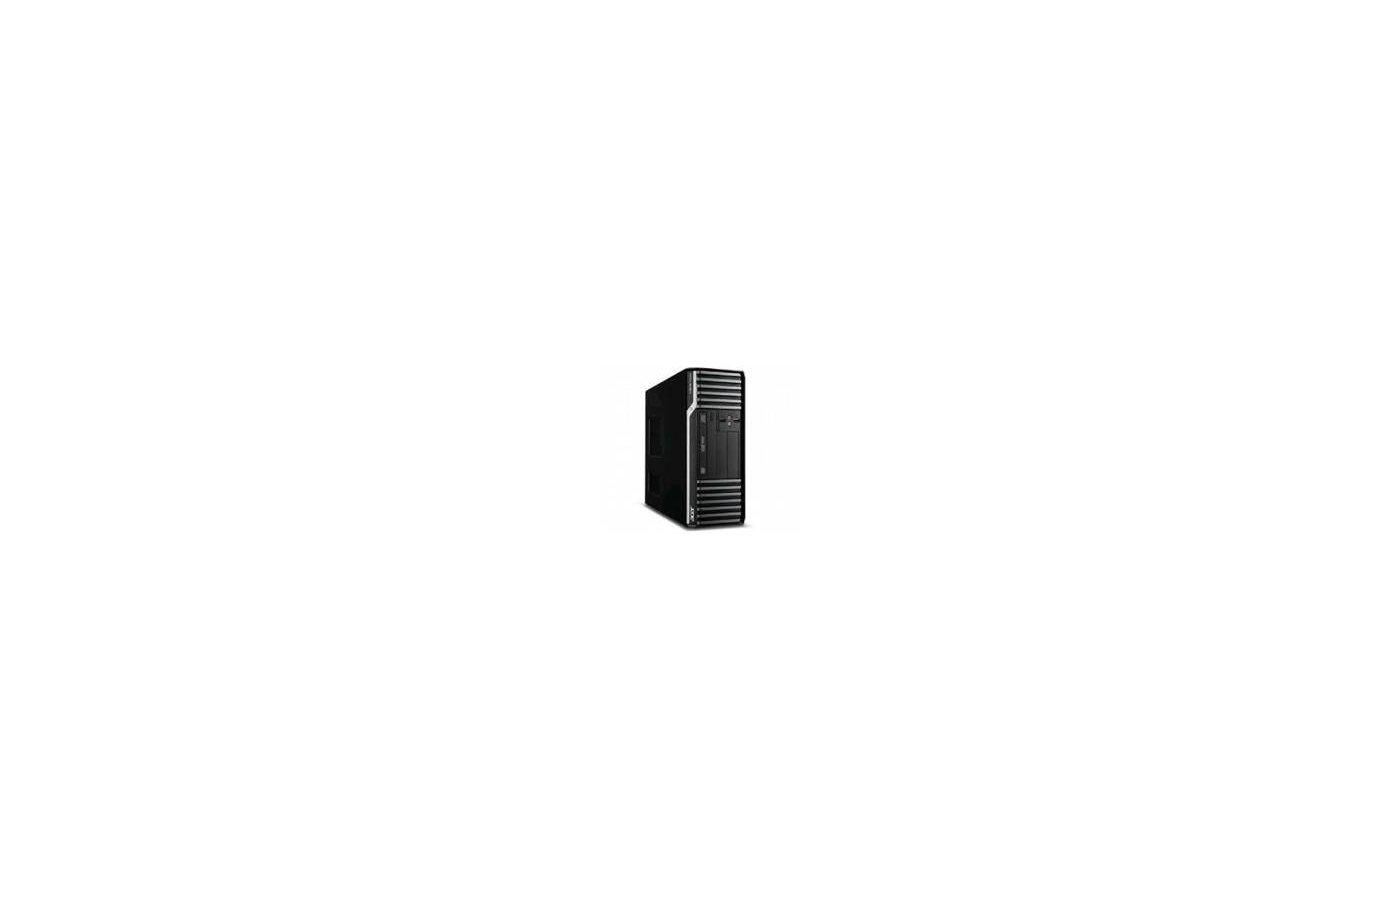 Системный блок Acer Veriton S4630G /DT.VJQER.056/